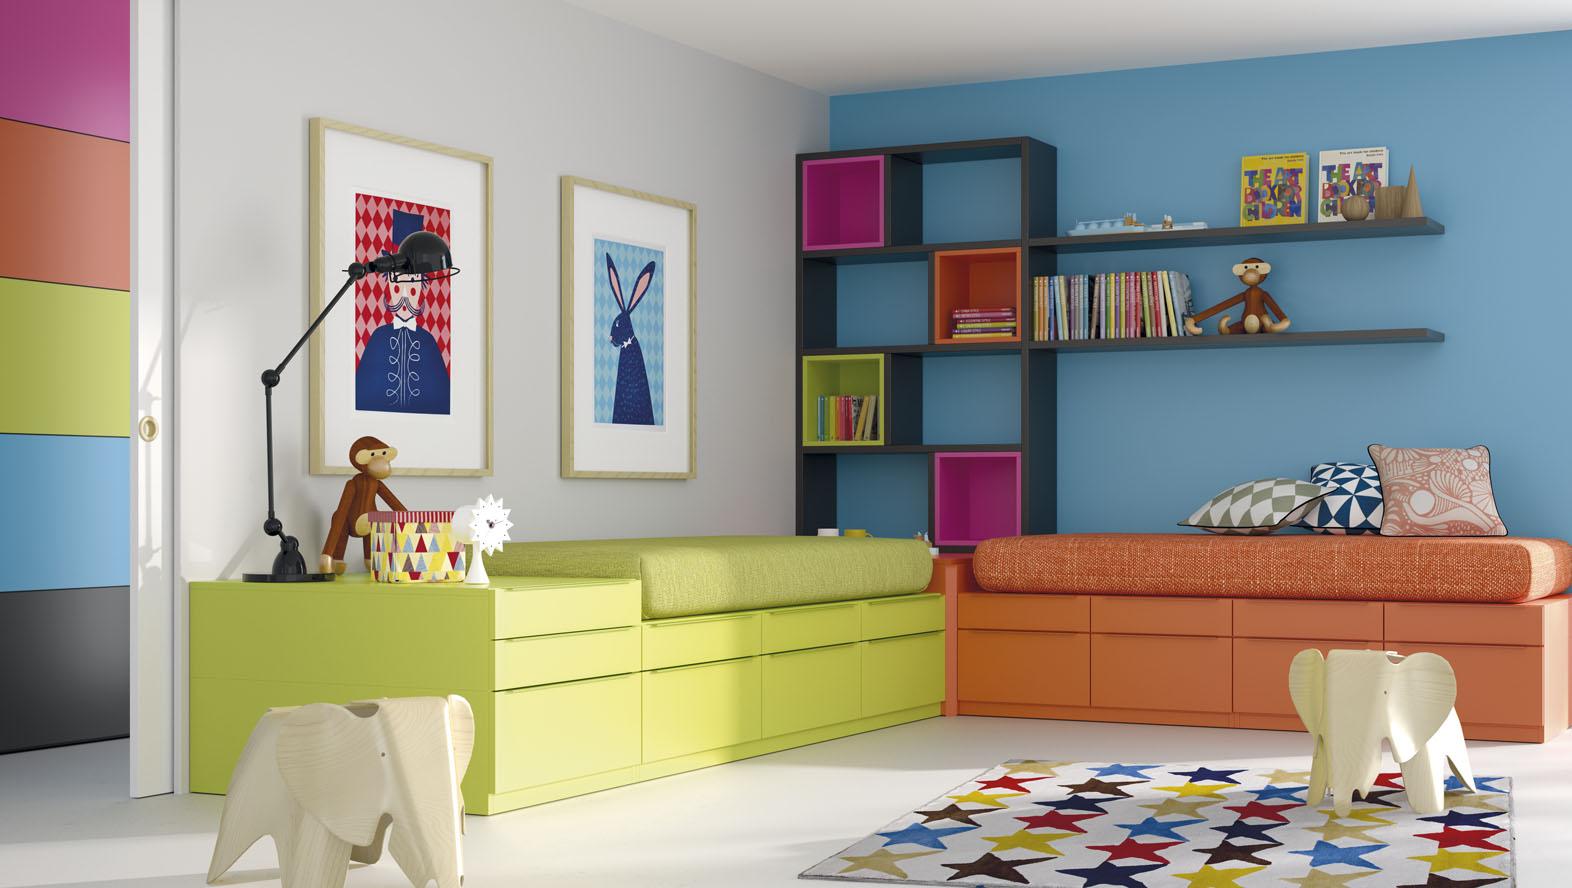 Dormitorios Infantiles Nios Cool Best Dormitorios Infantiles Para